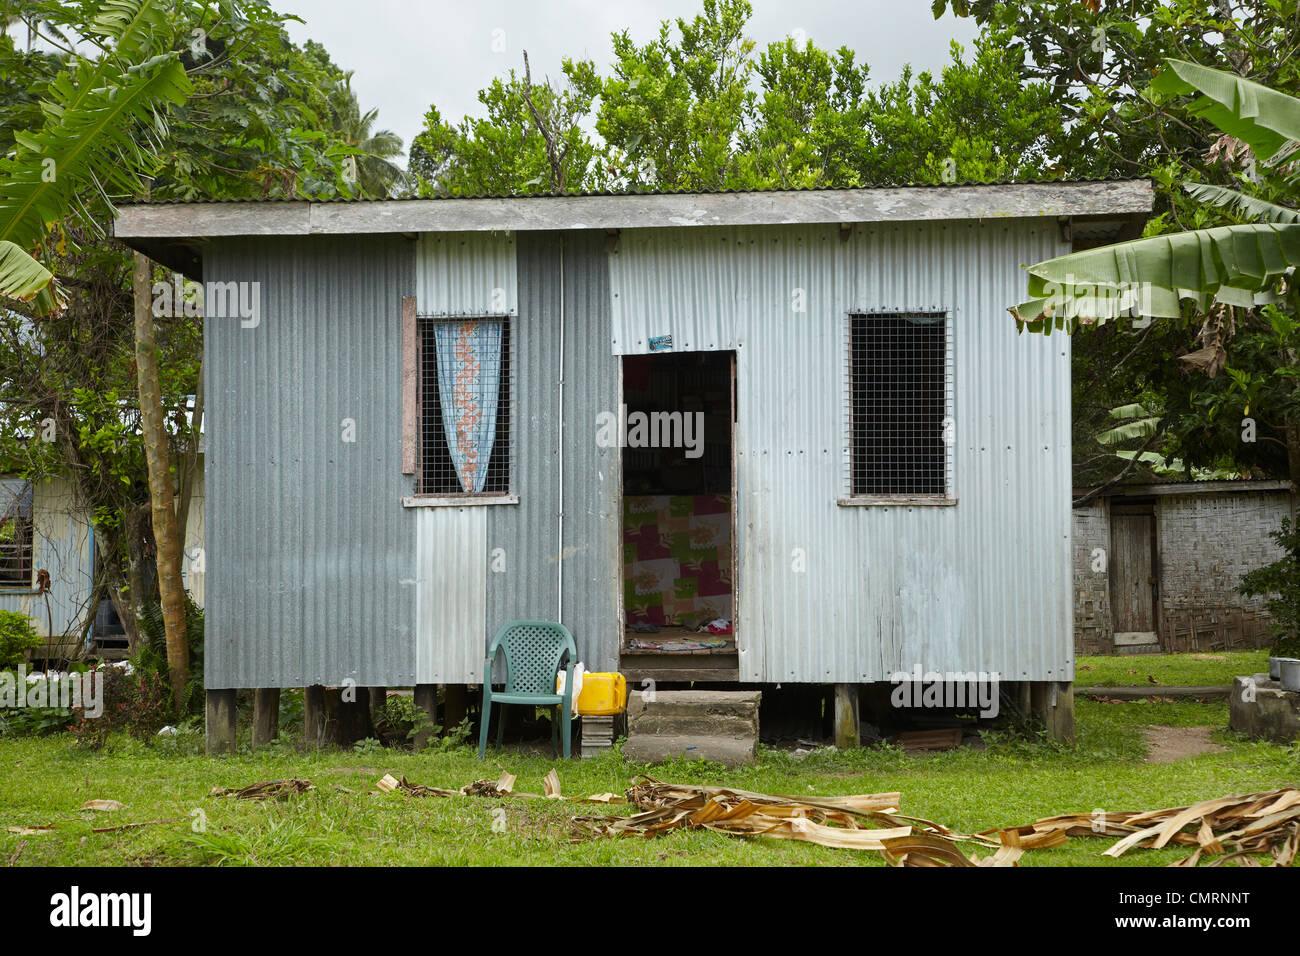 Corrugated iron house, Namaqumaqua village, Coral Coast, Viti Levu, Fiji, South Pacific - Stock Image